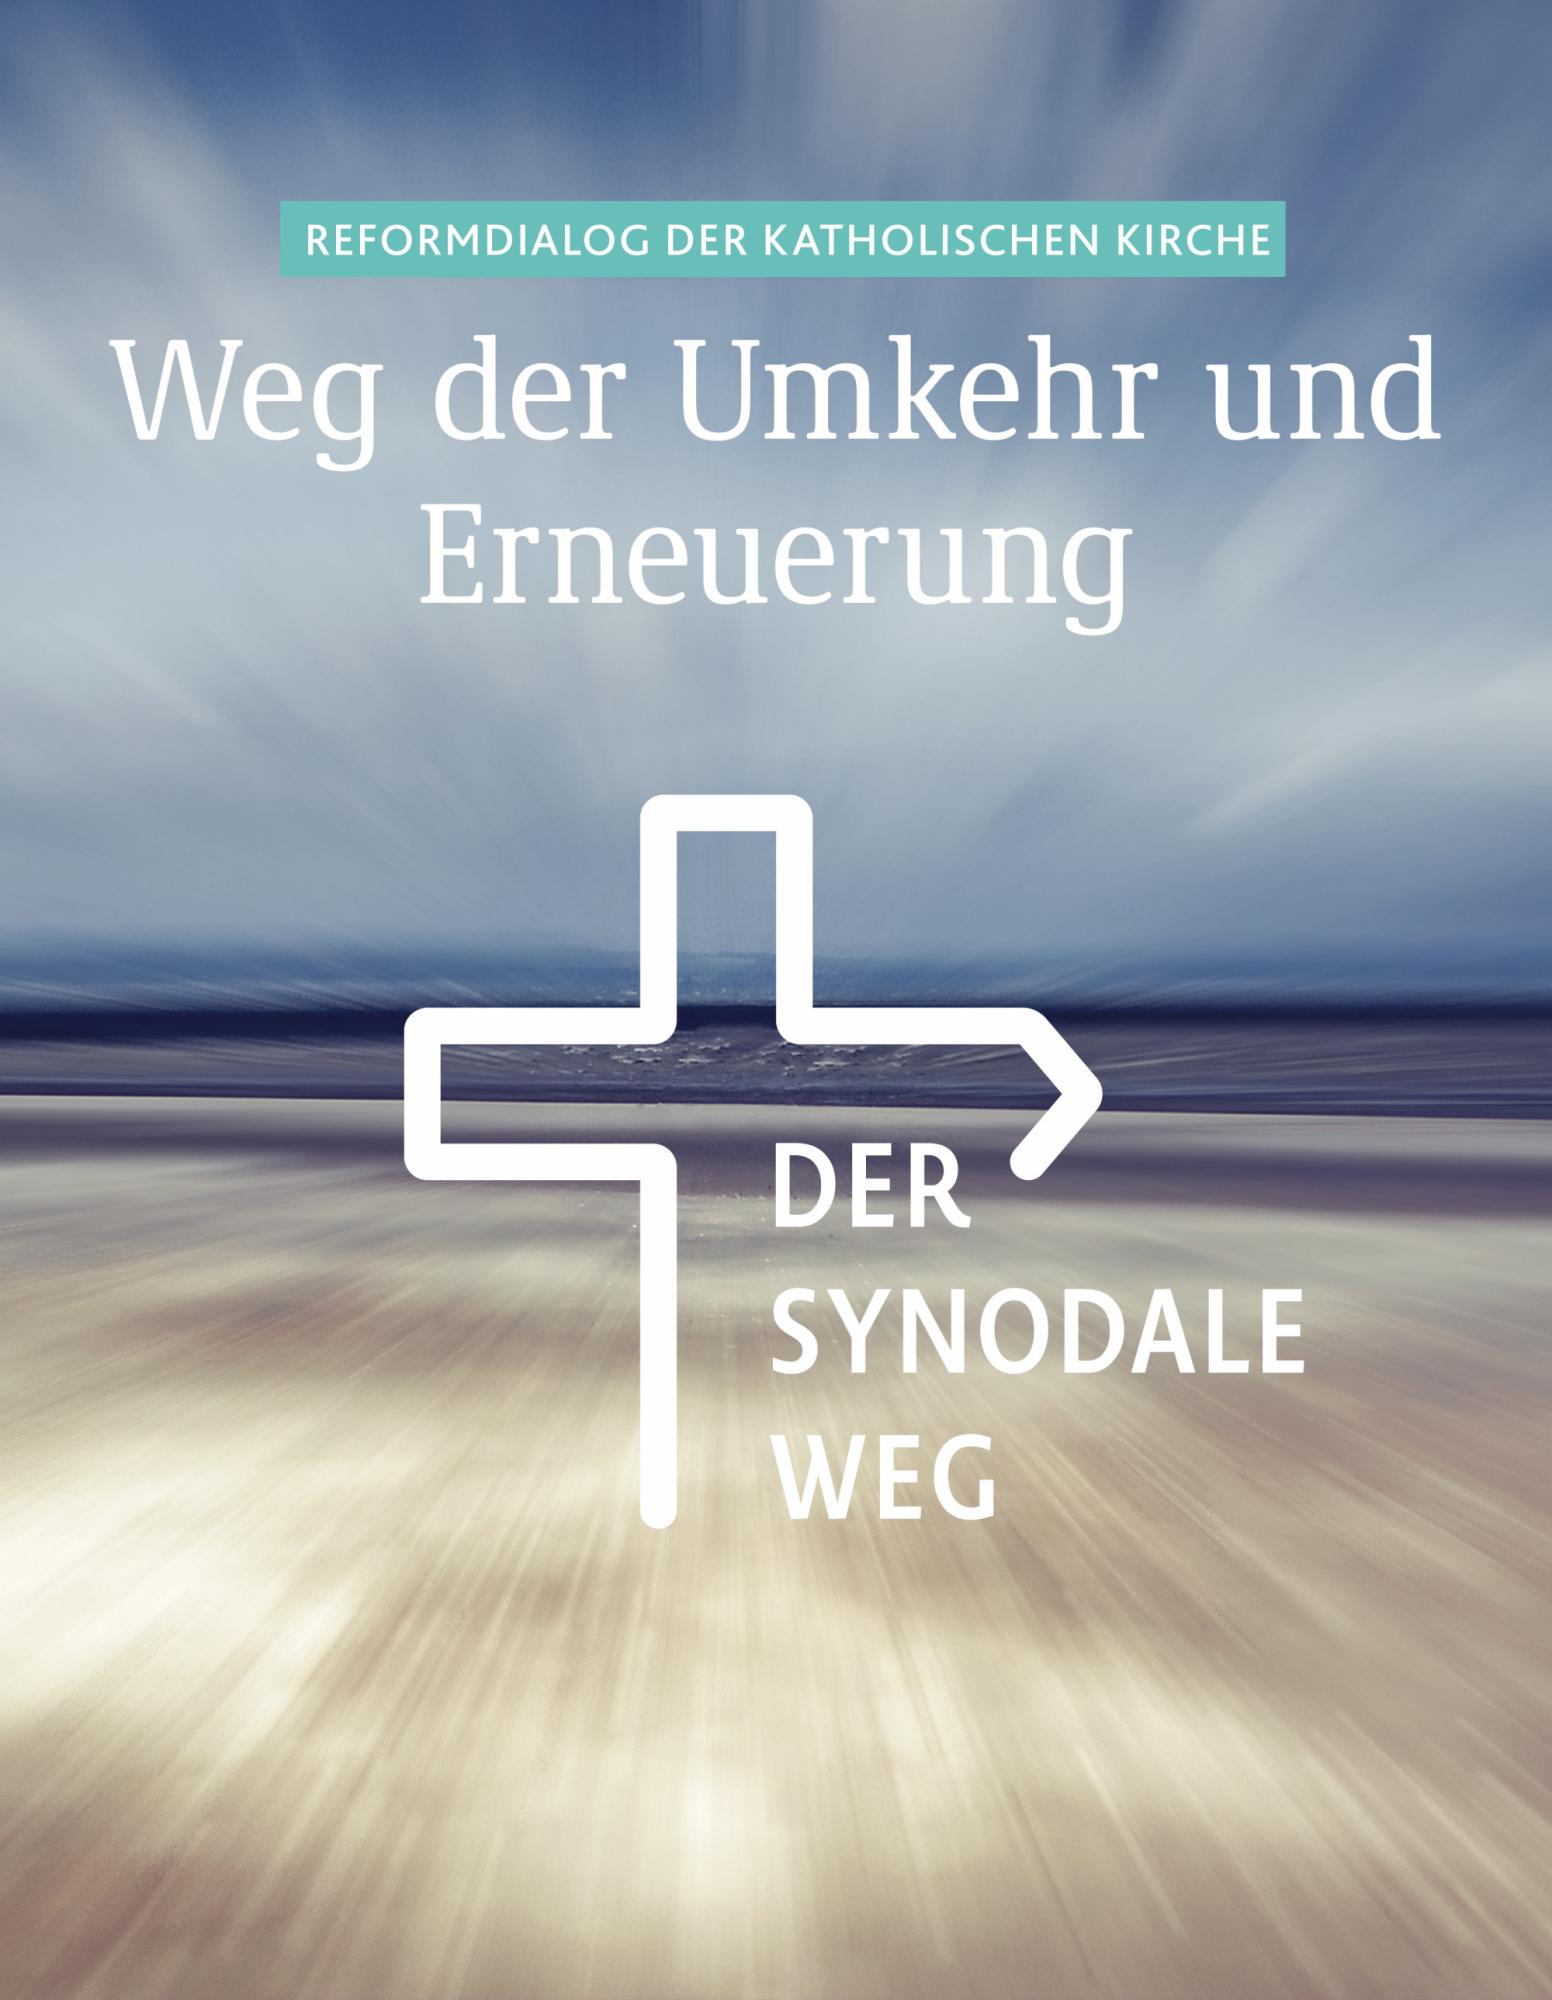 Bpa_776x1000px_Synodaler Weg_2_191126